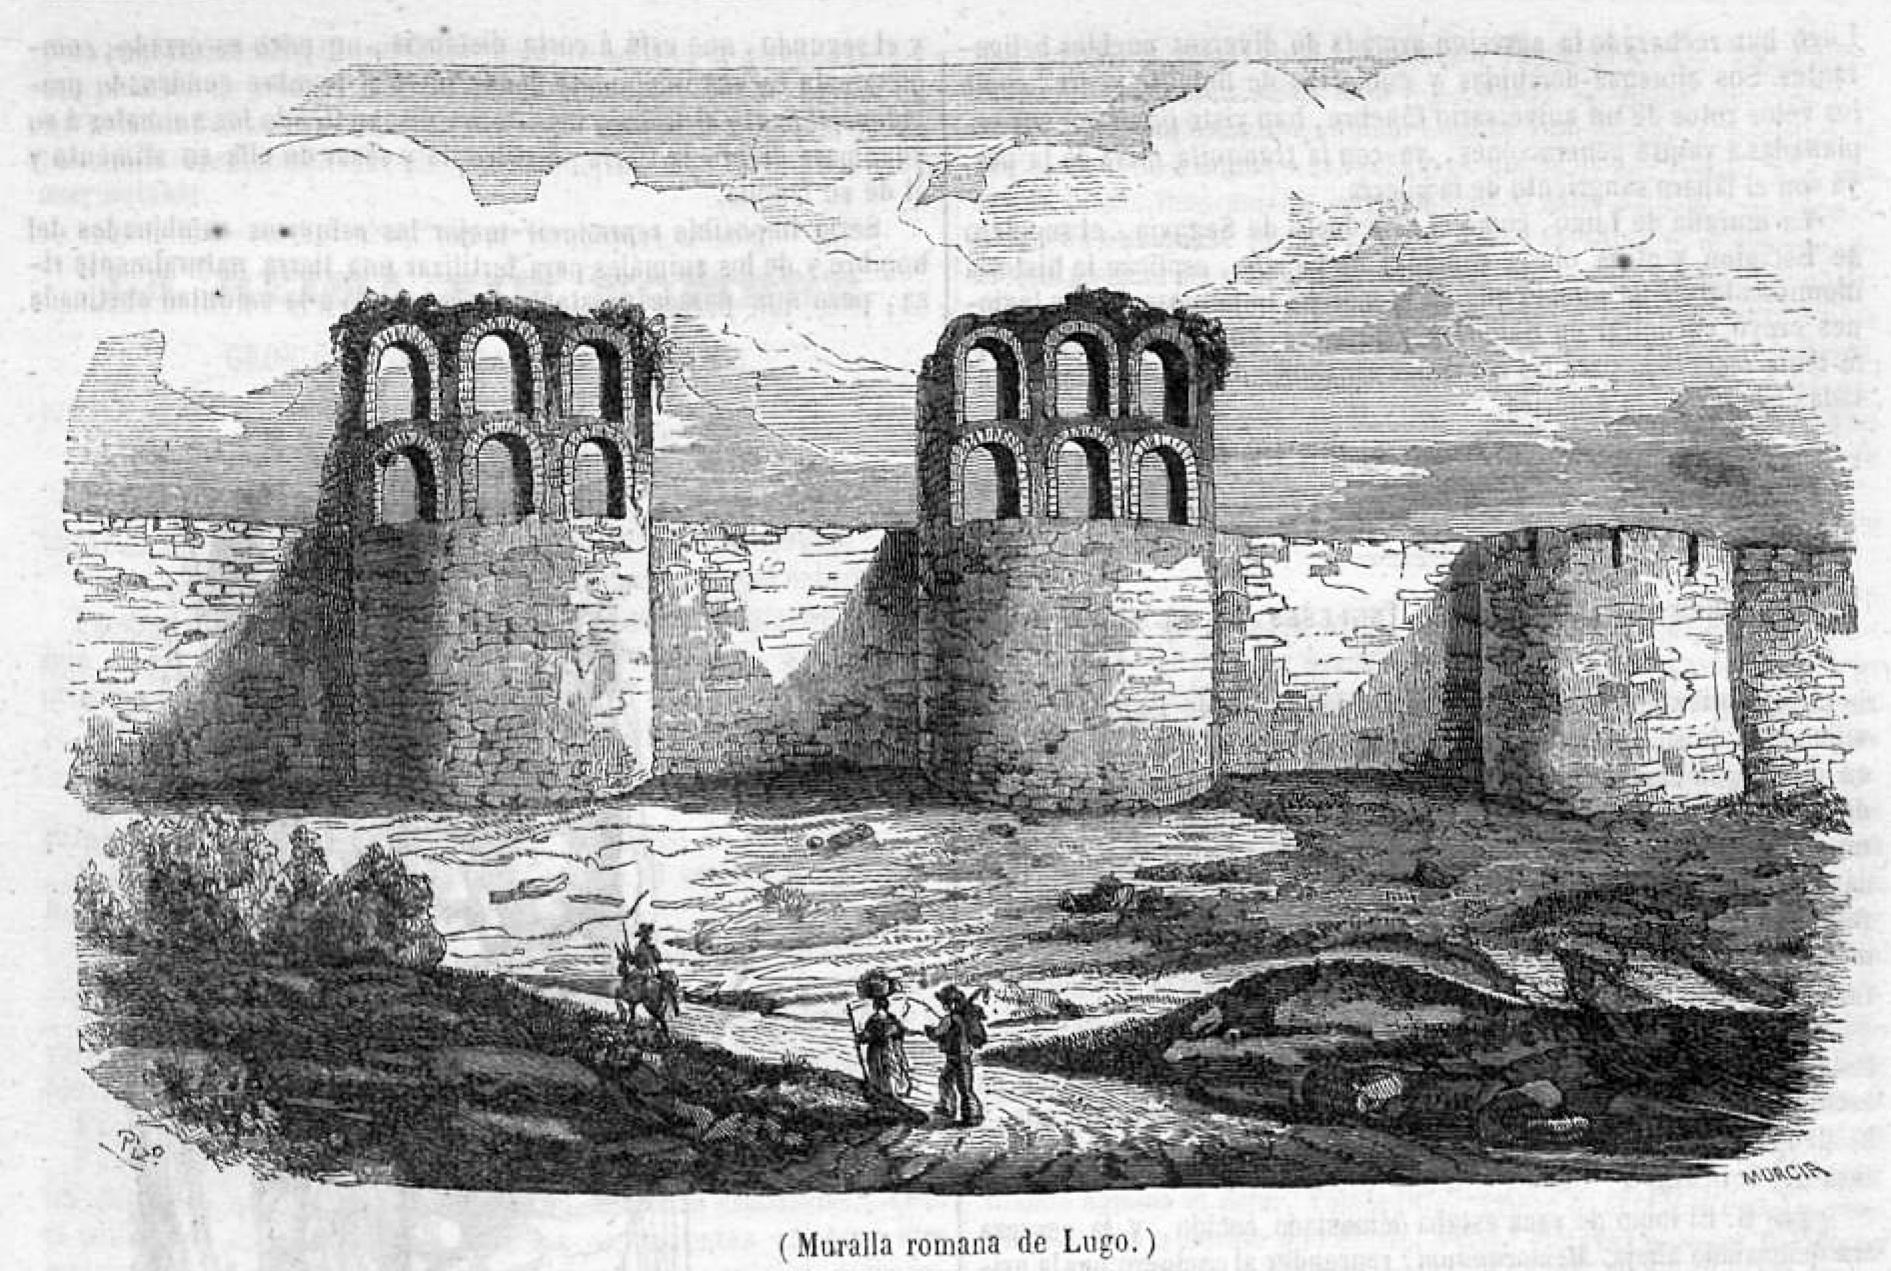 File:1850-10-06, Semanario Pintoresco Español, Muralla romana de Lugo,  Pizarro.jpg